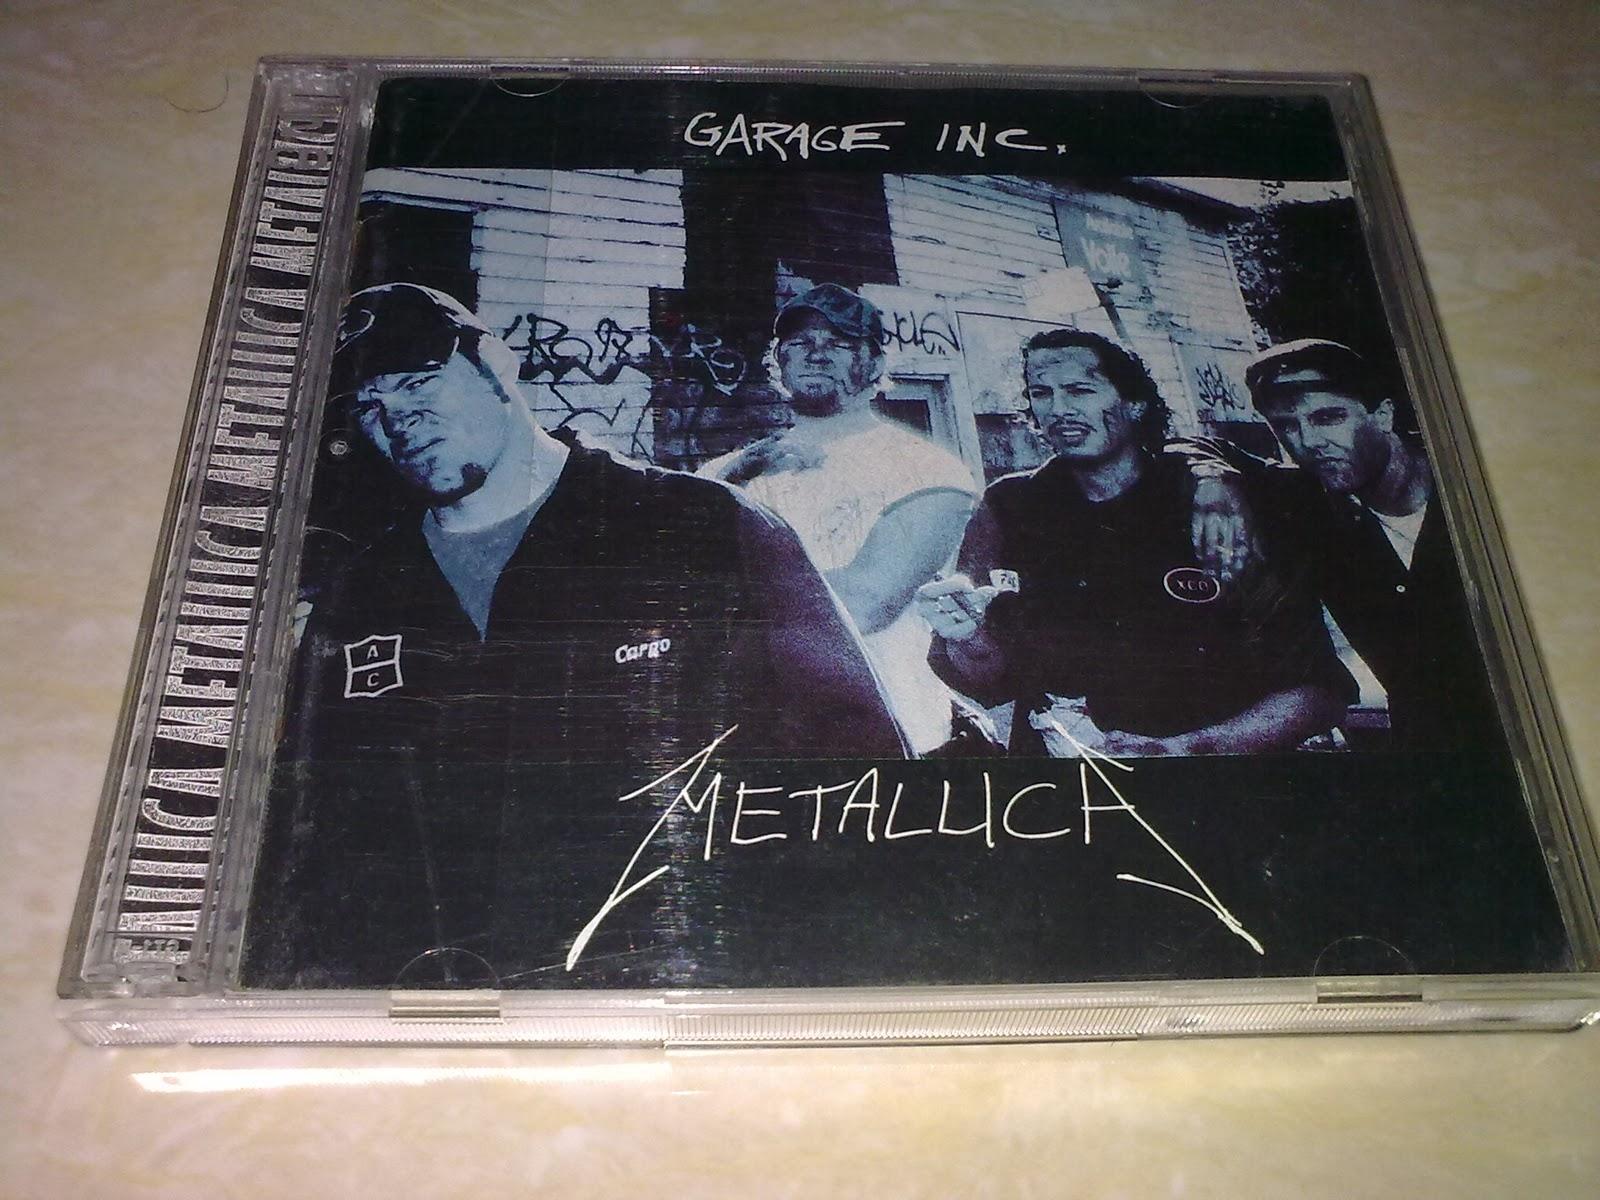 Metallica Garage Inc Cd